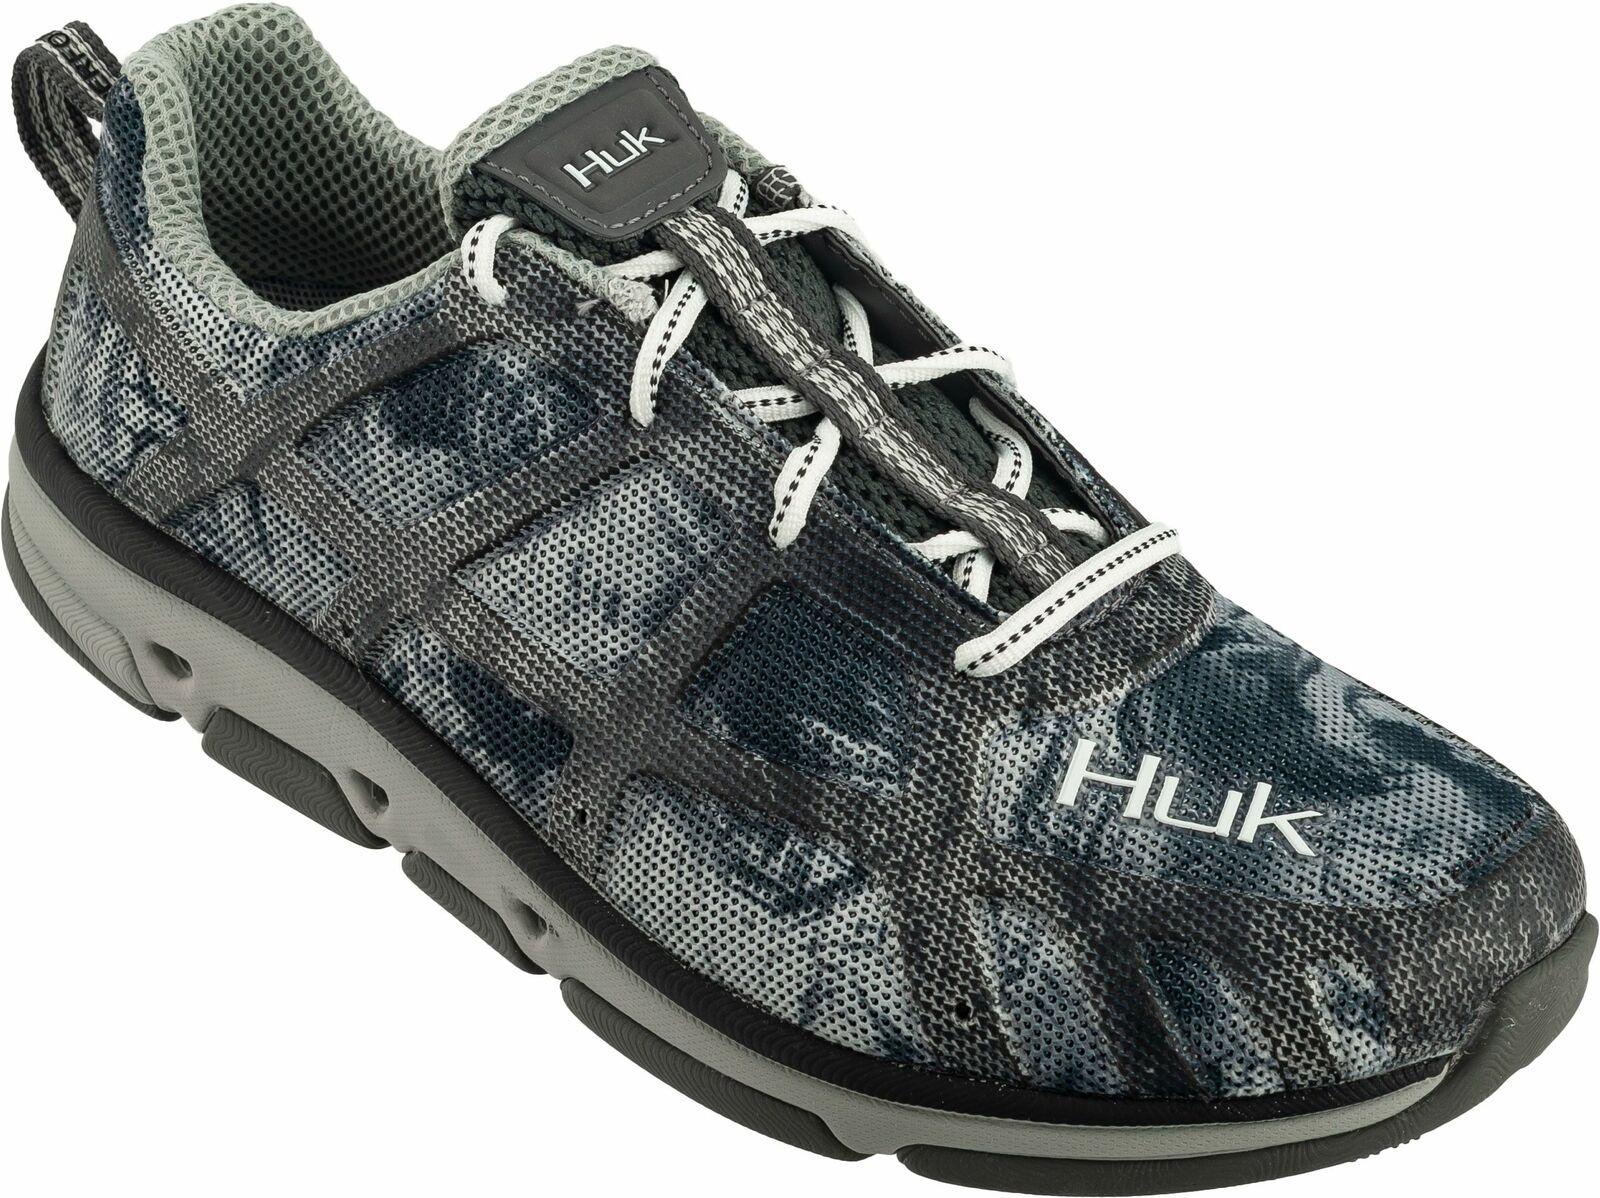 new HUK Performance Attack Shoe Fishing Boating Sneaker Subphantis H8011000-185